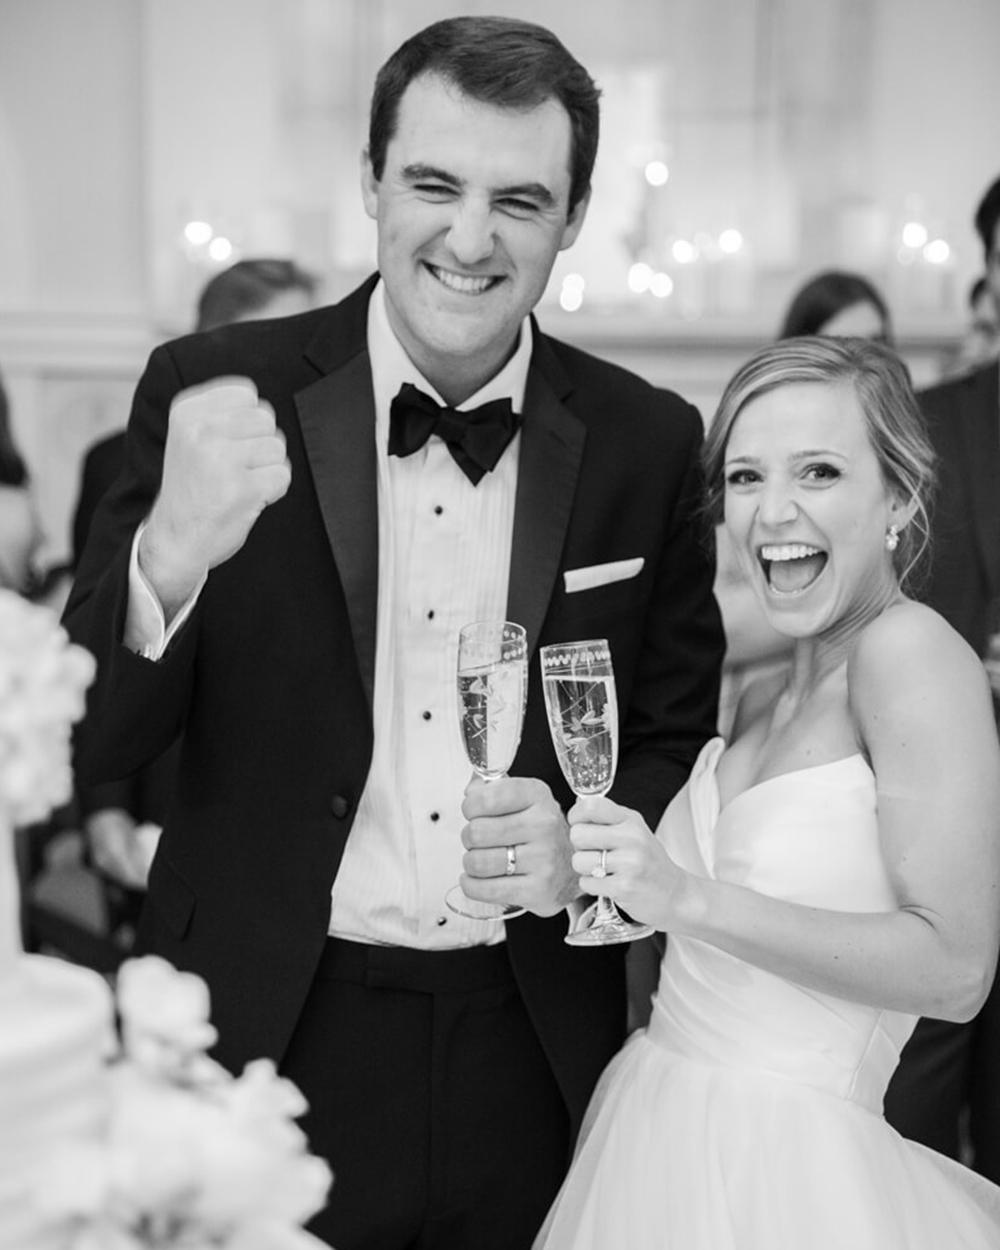 A Winter Wonderland Wedding for Meredith and Scottie